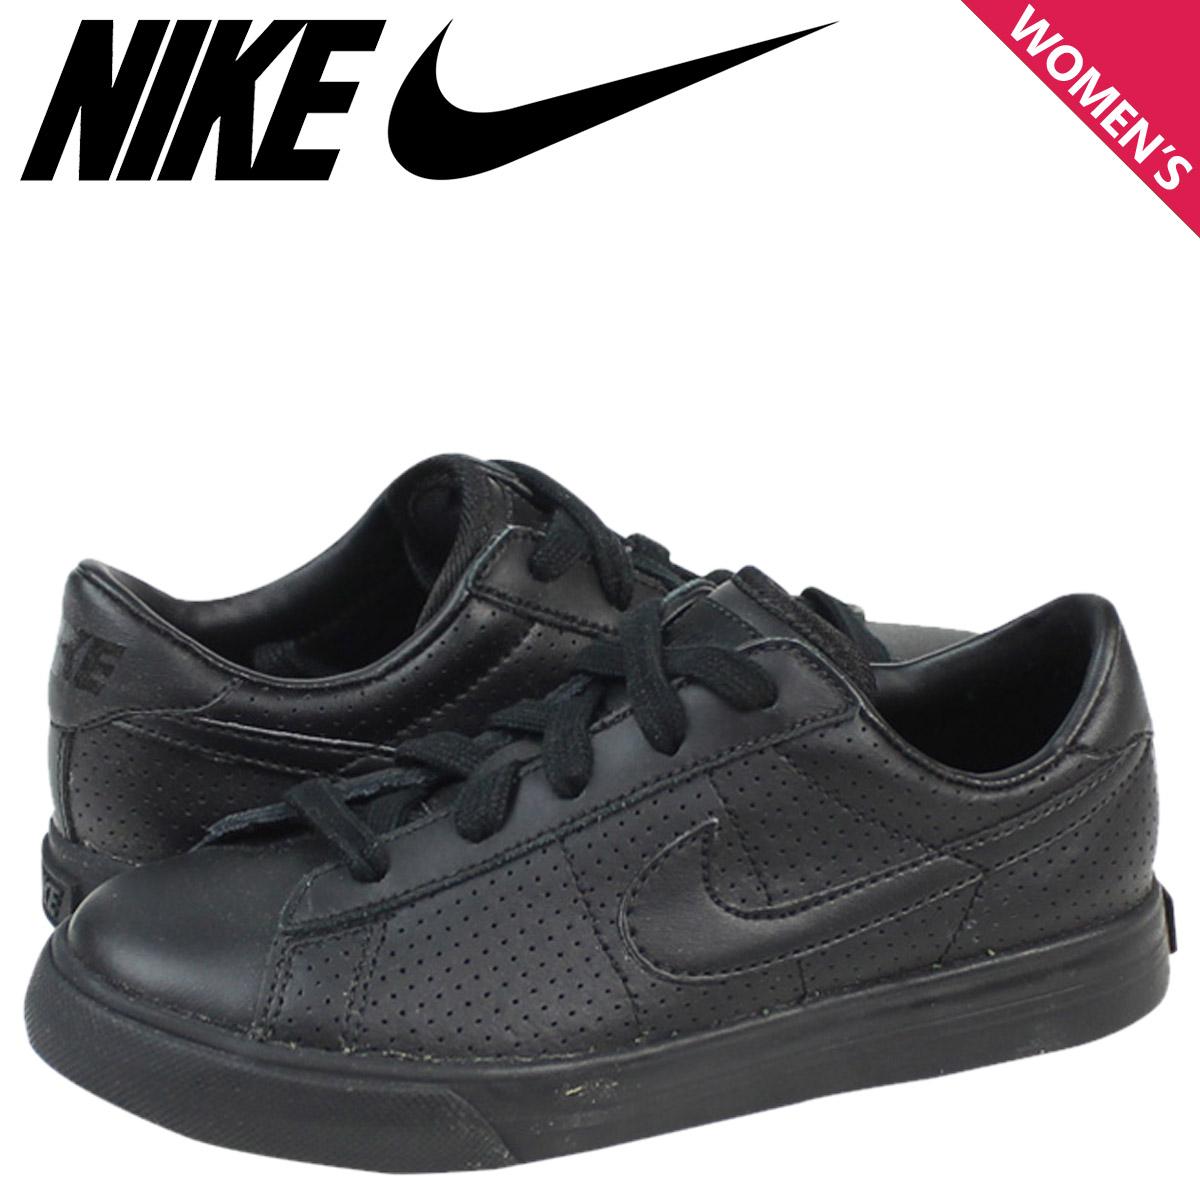 9cb4476ff5987 Womens Nike Sweet Classic Greek jordan sneakers cheap